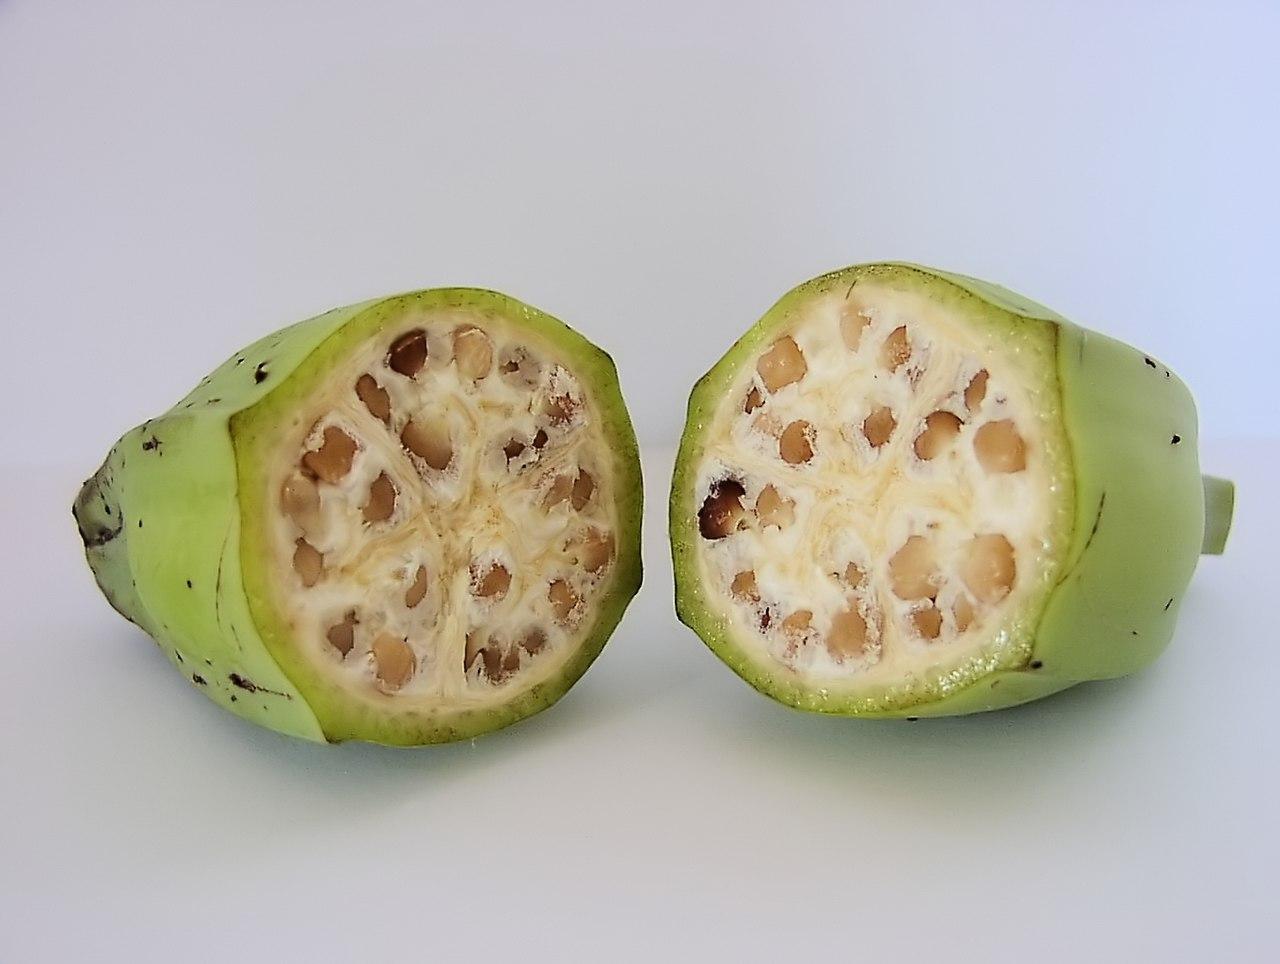 Picture of Musa balbisiana banana with seeds